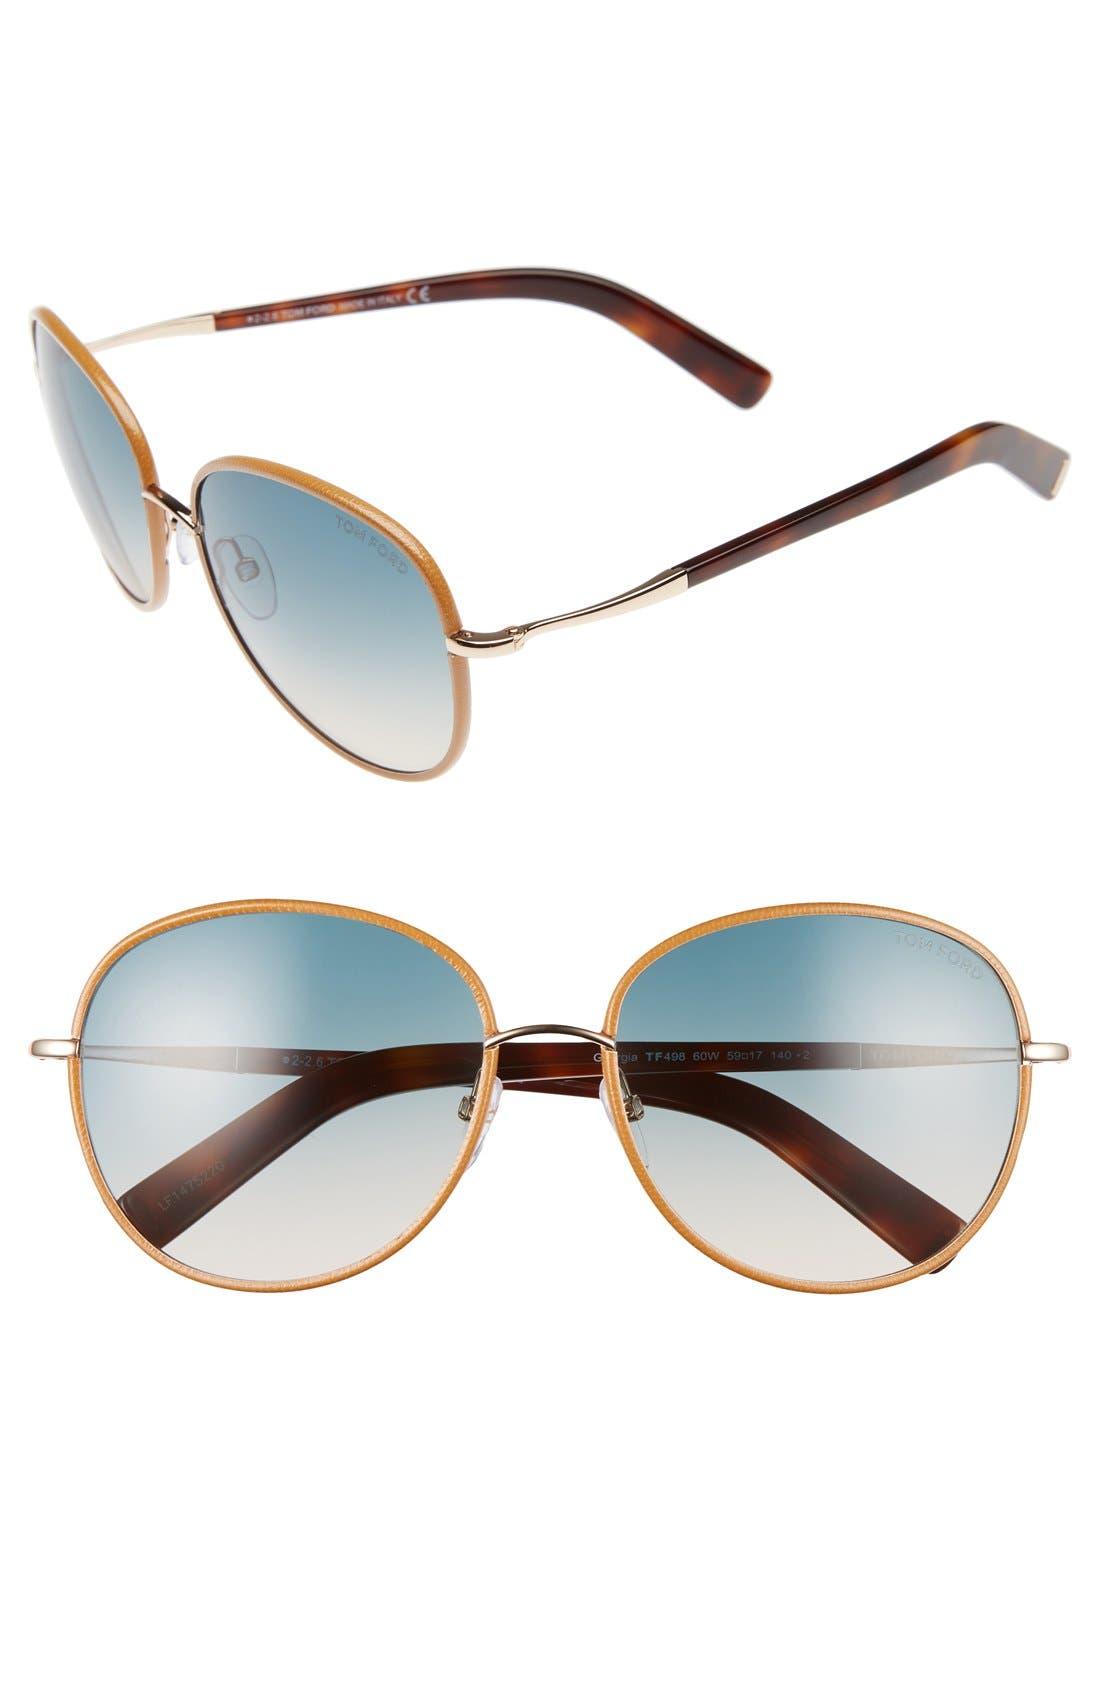 Georgia 59mm Sunglasses,                         Main,                         color, Rose Gold/ Beige/ Sand